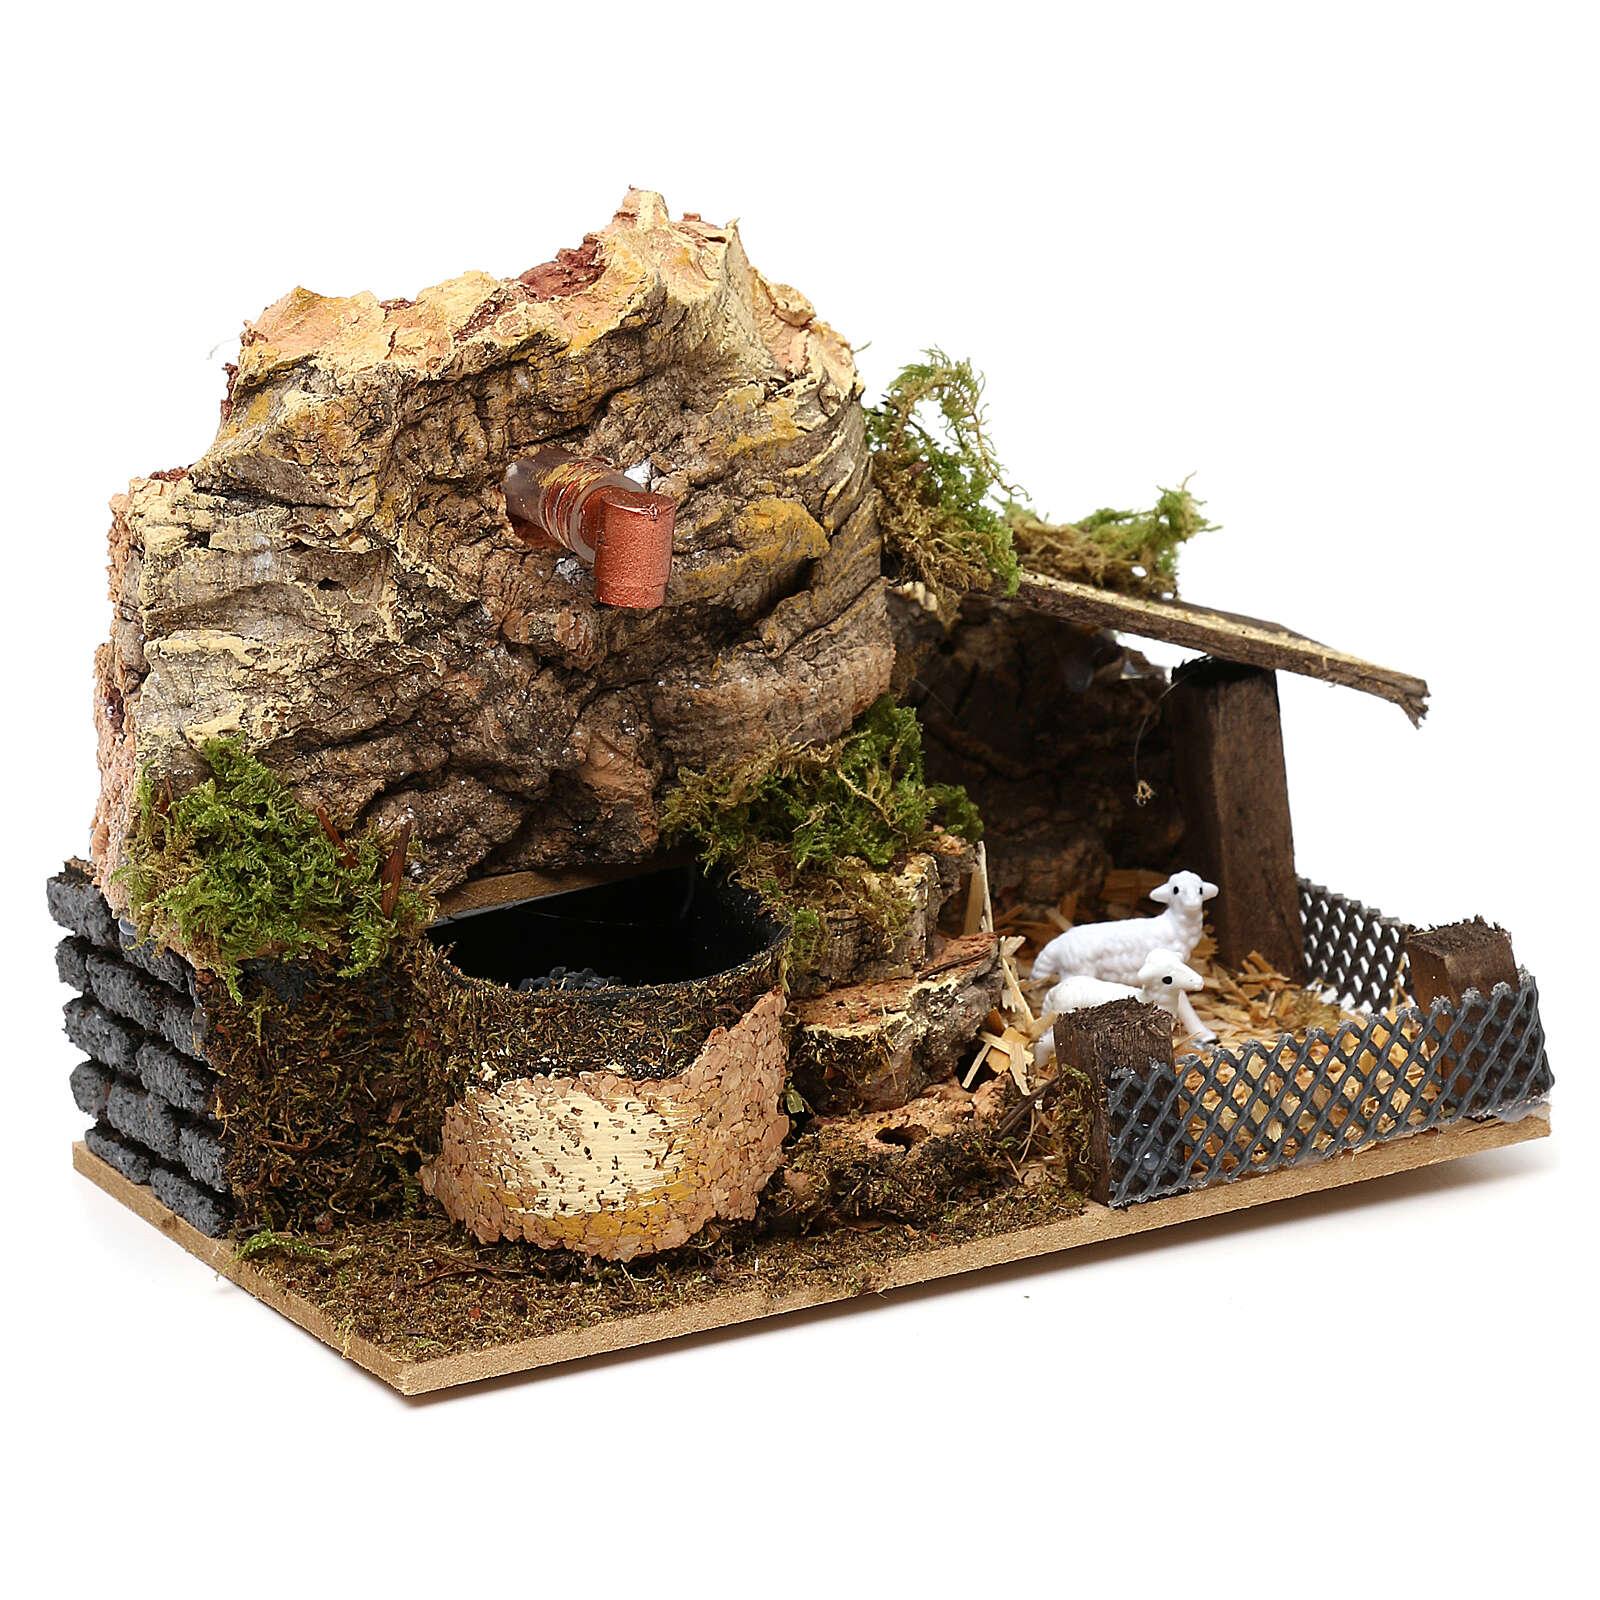 Working fountain cork with sheepfold 10x15x10 cm, for 7 cm nativity 4